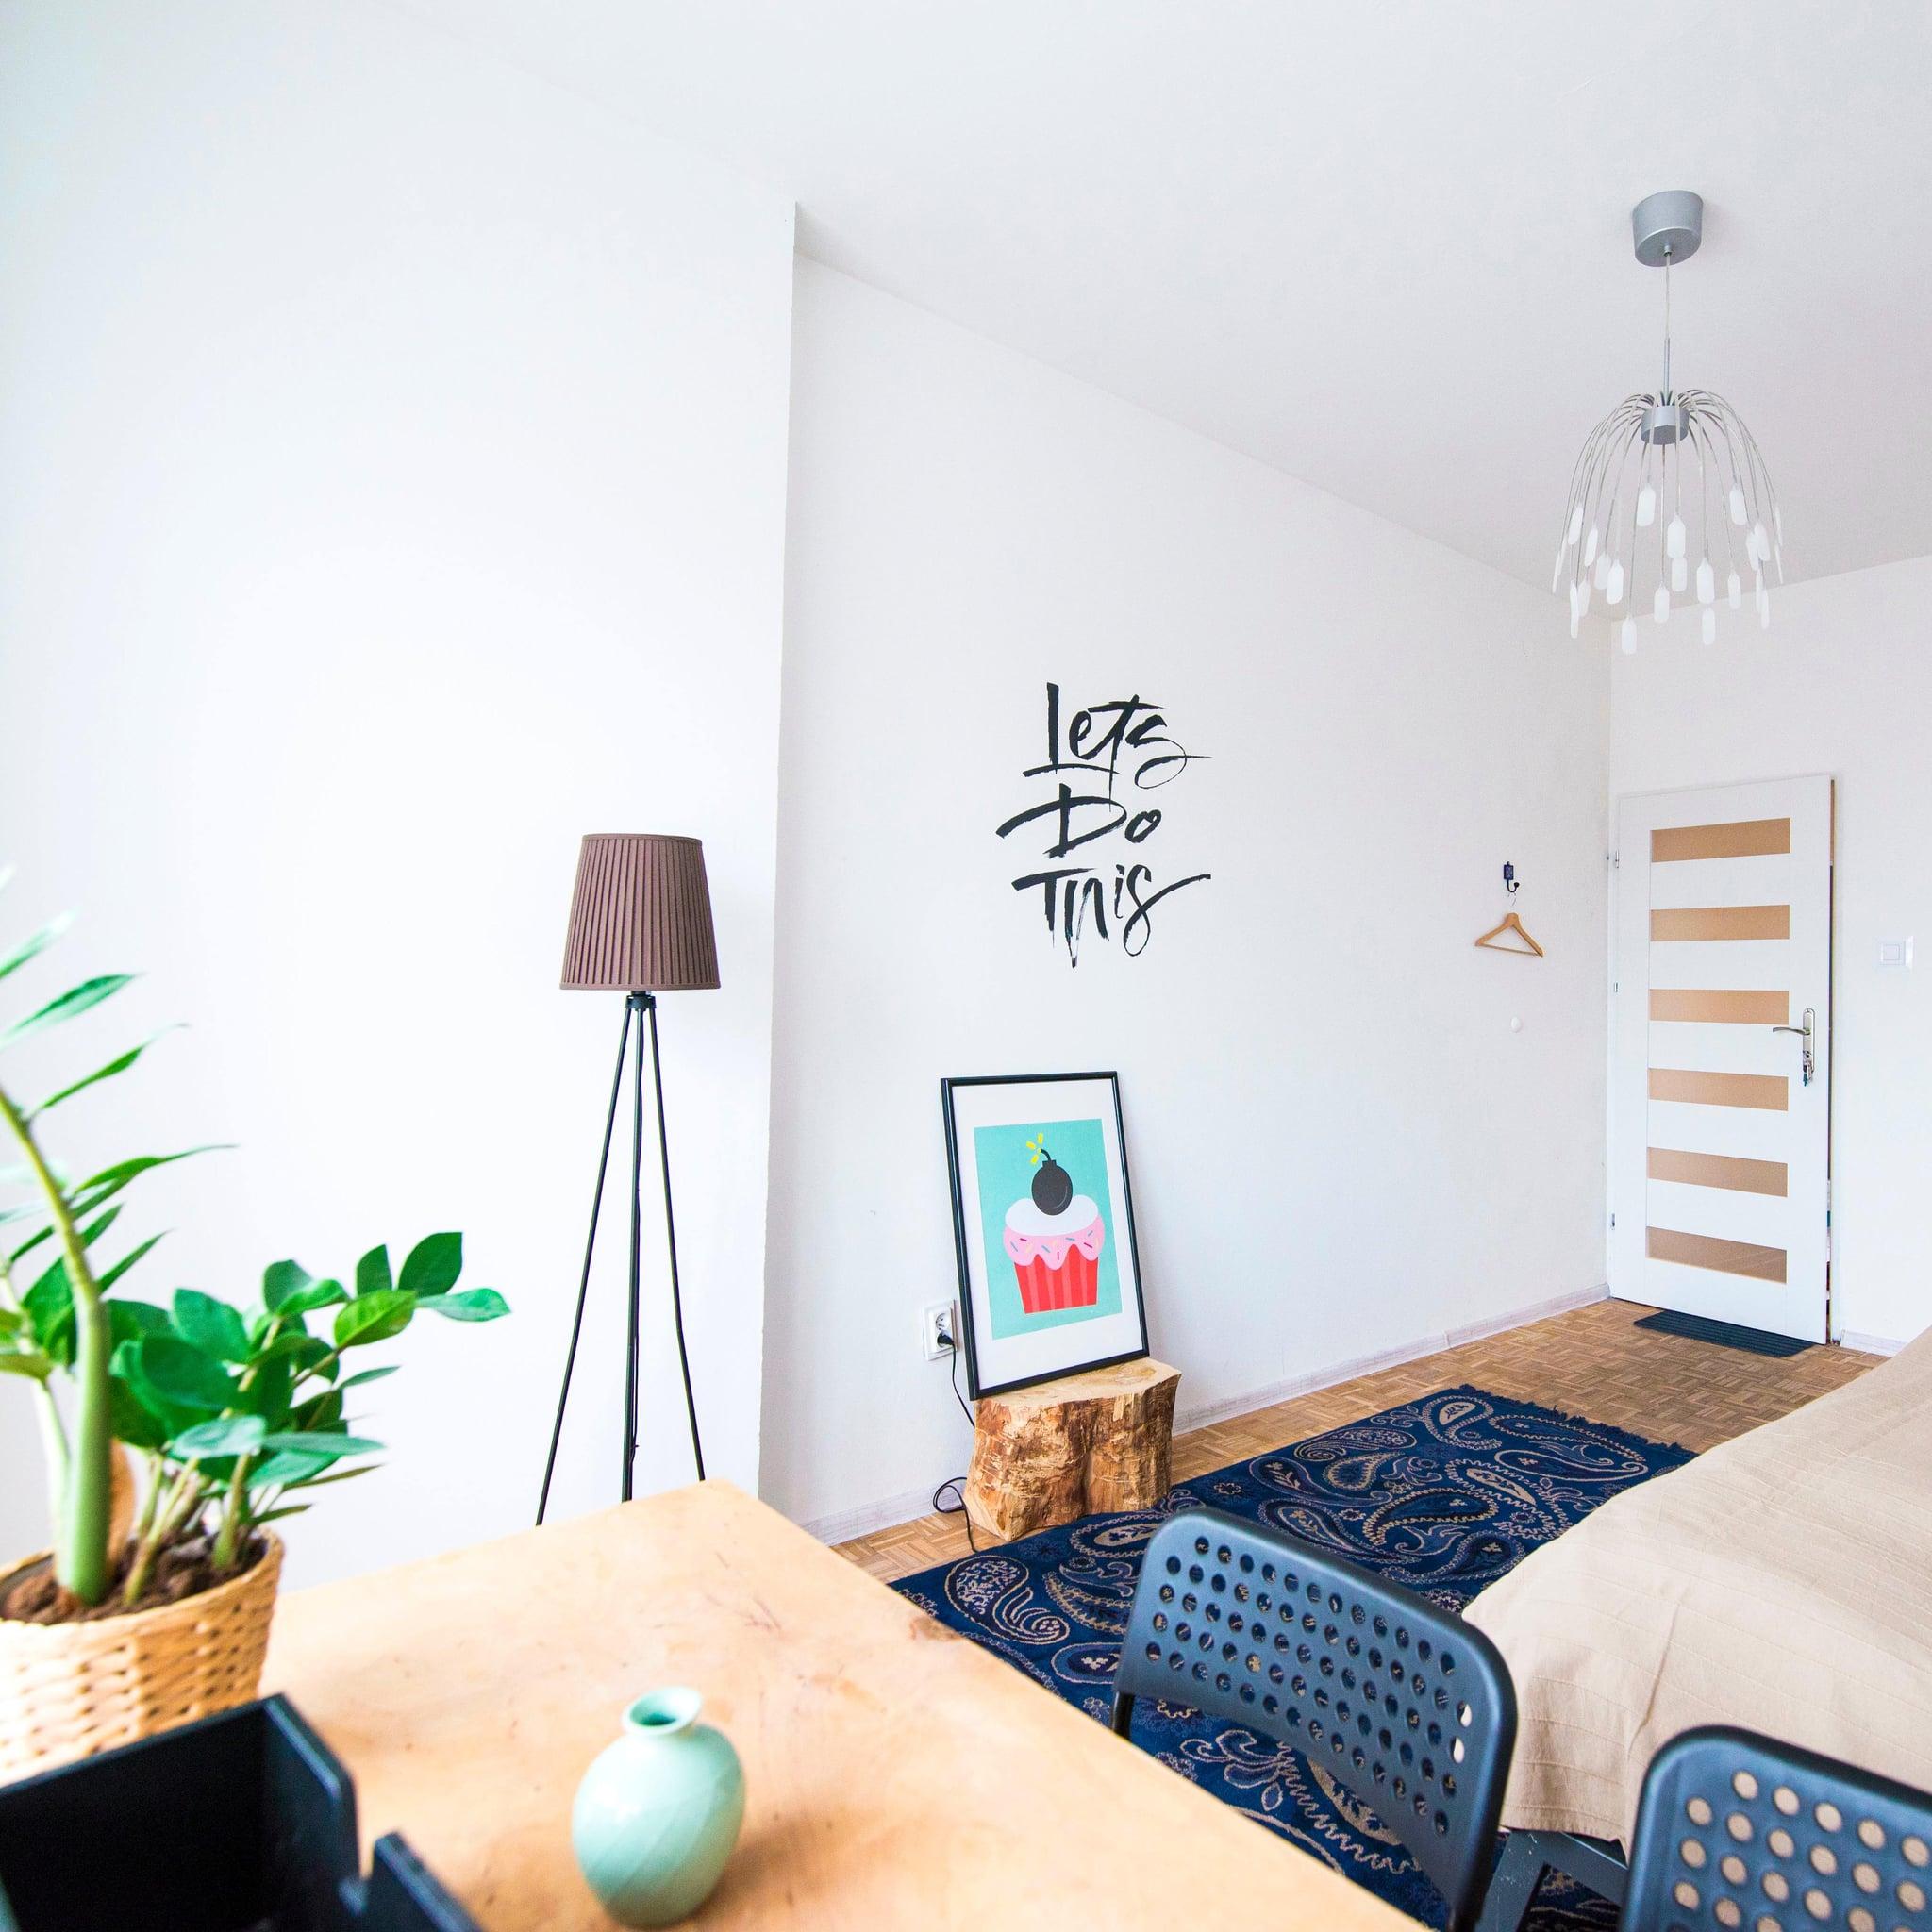 best room decor top unique rental for decorating wedding under photo ideas design interior at stunning idea sofa